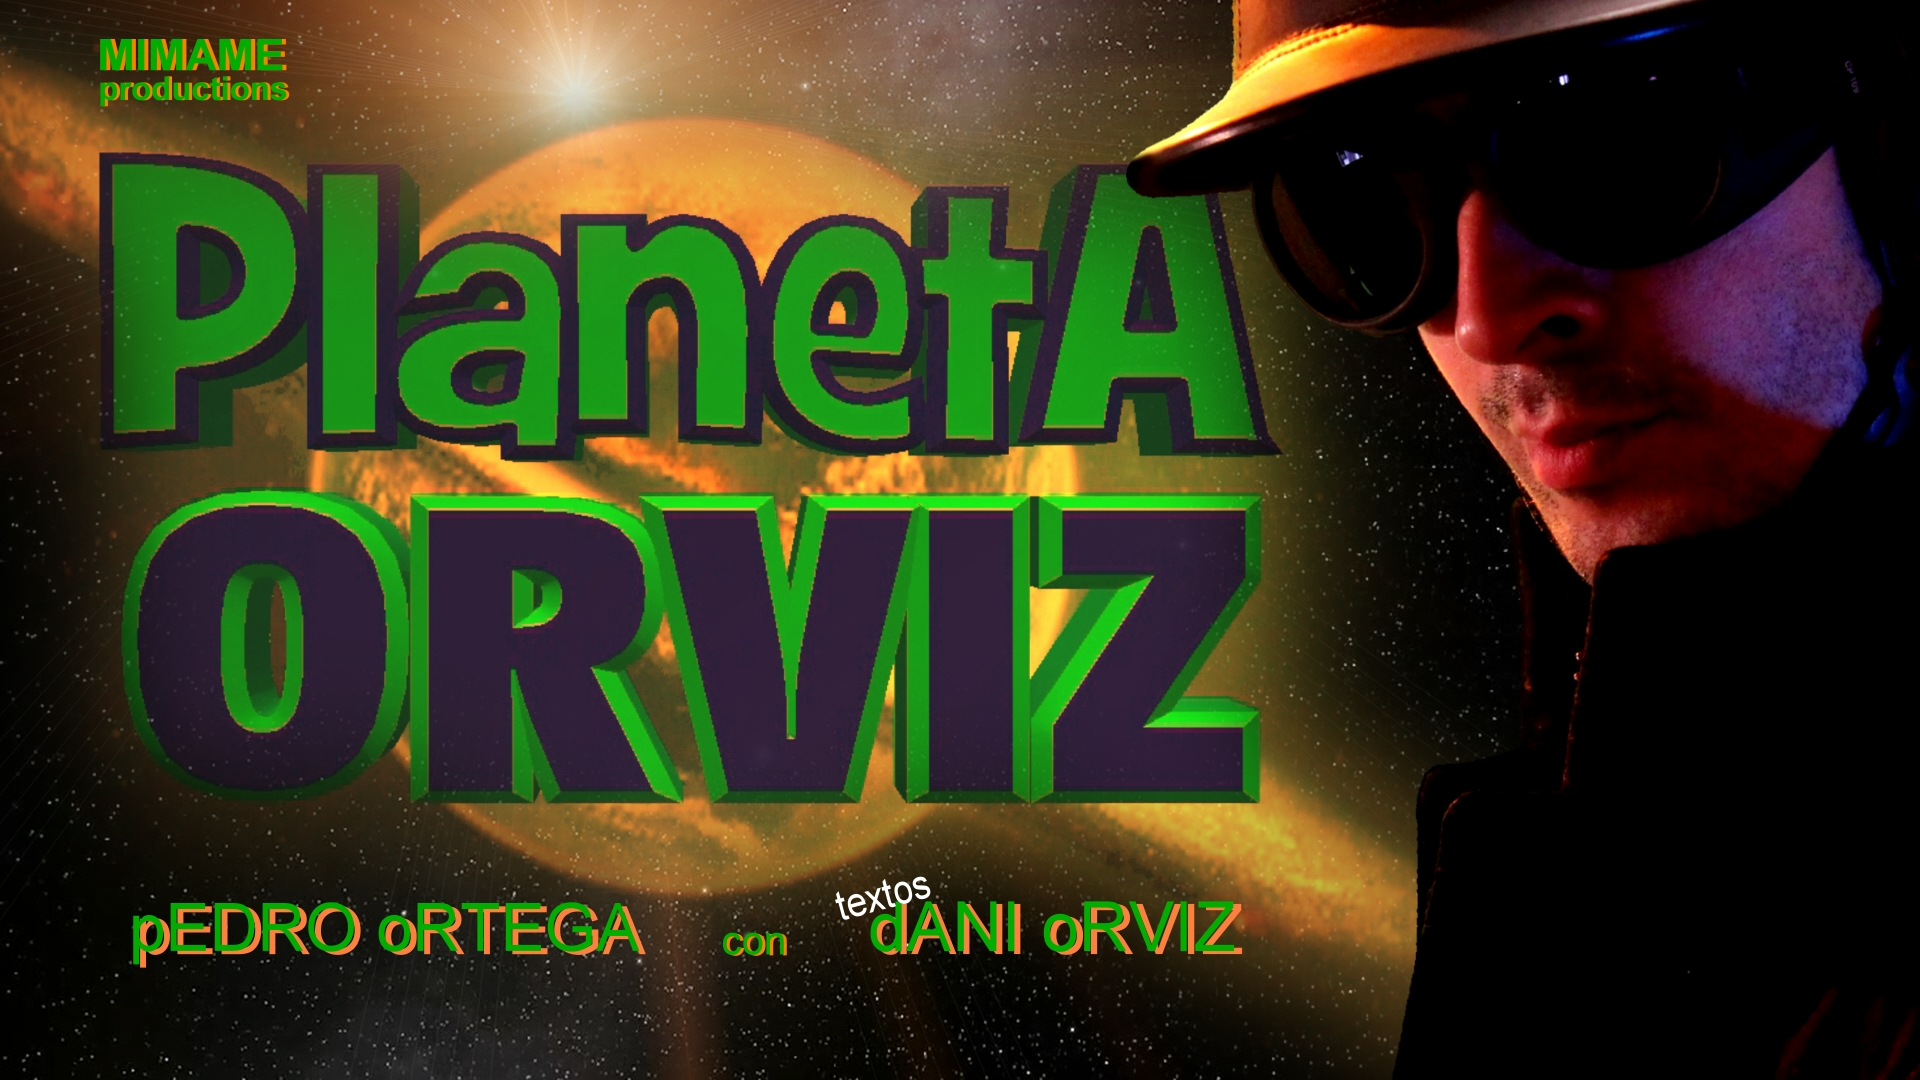 """Planeta Orviz"" Mimame productions"